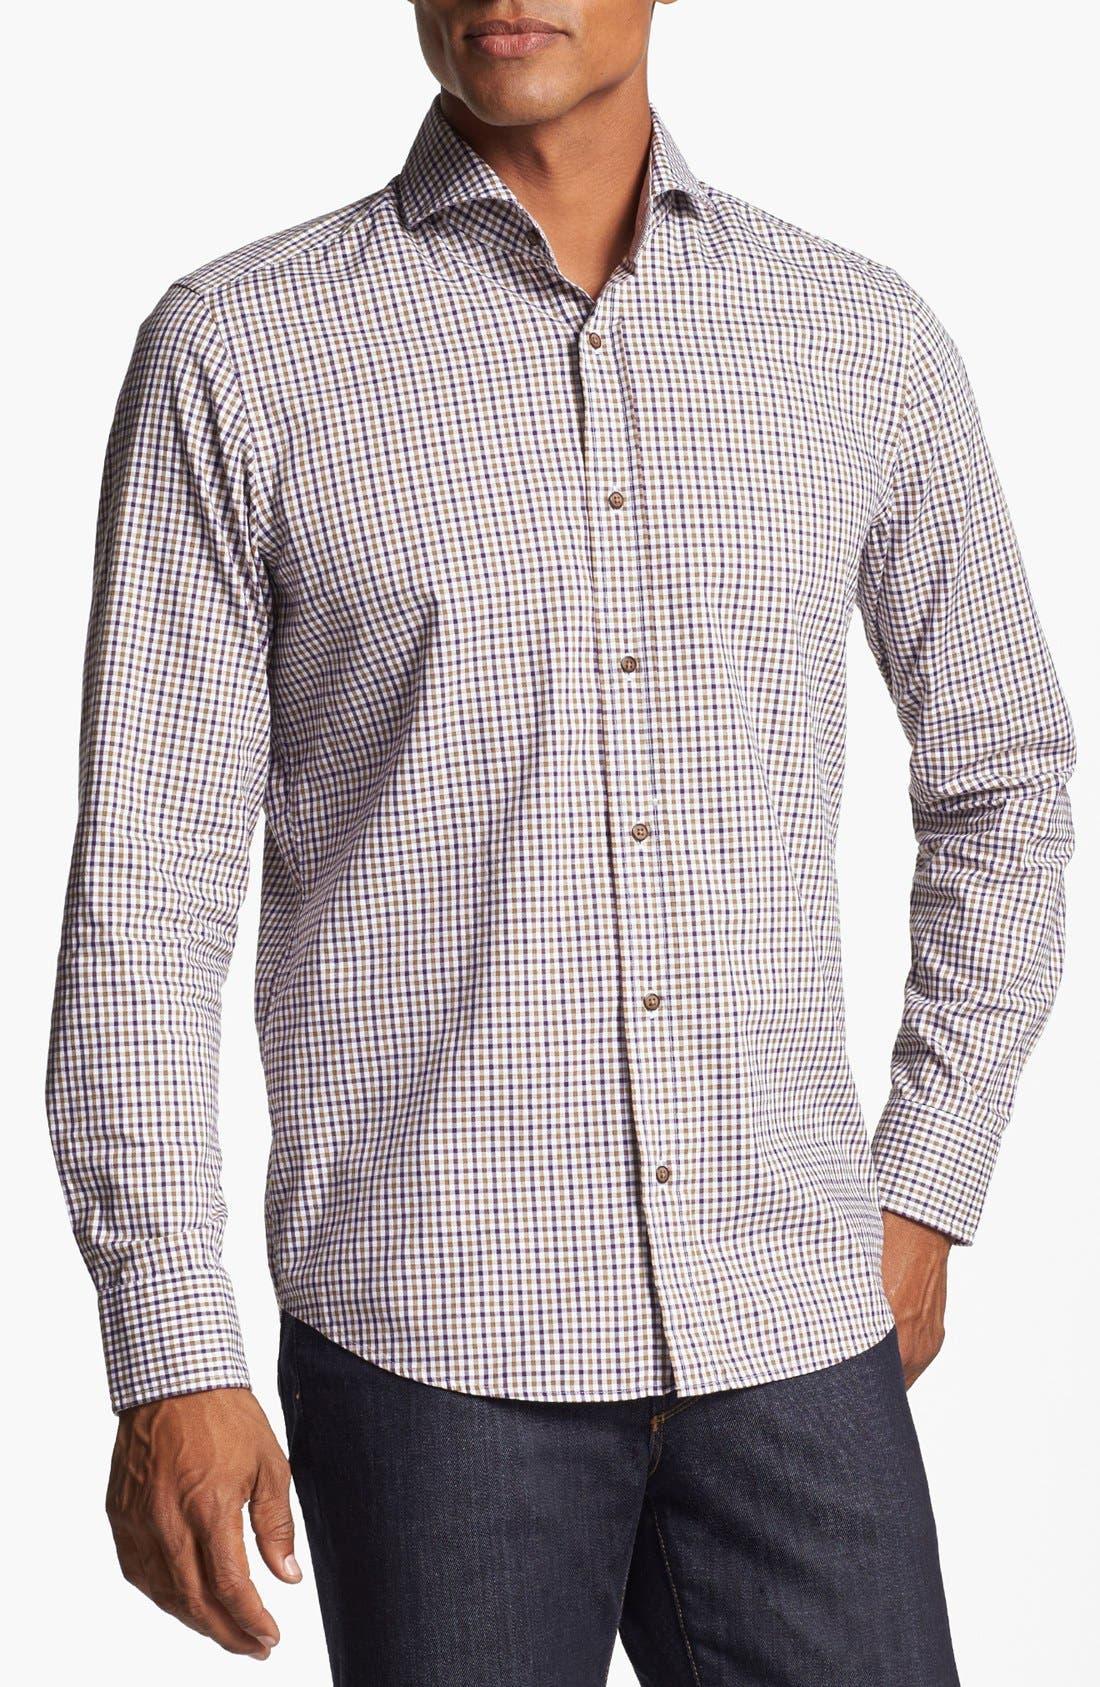 Main Image - BOSS HUGO BOSS 'Sean' Regular Fit Sport Shirt